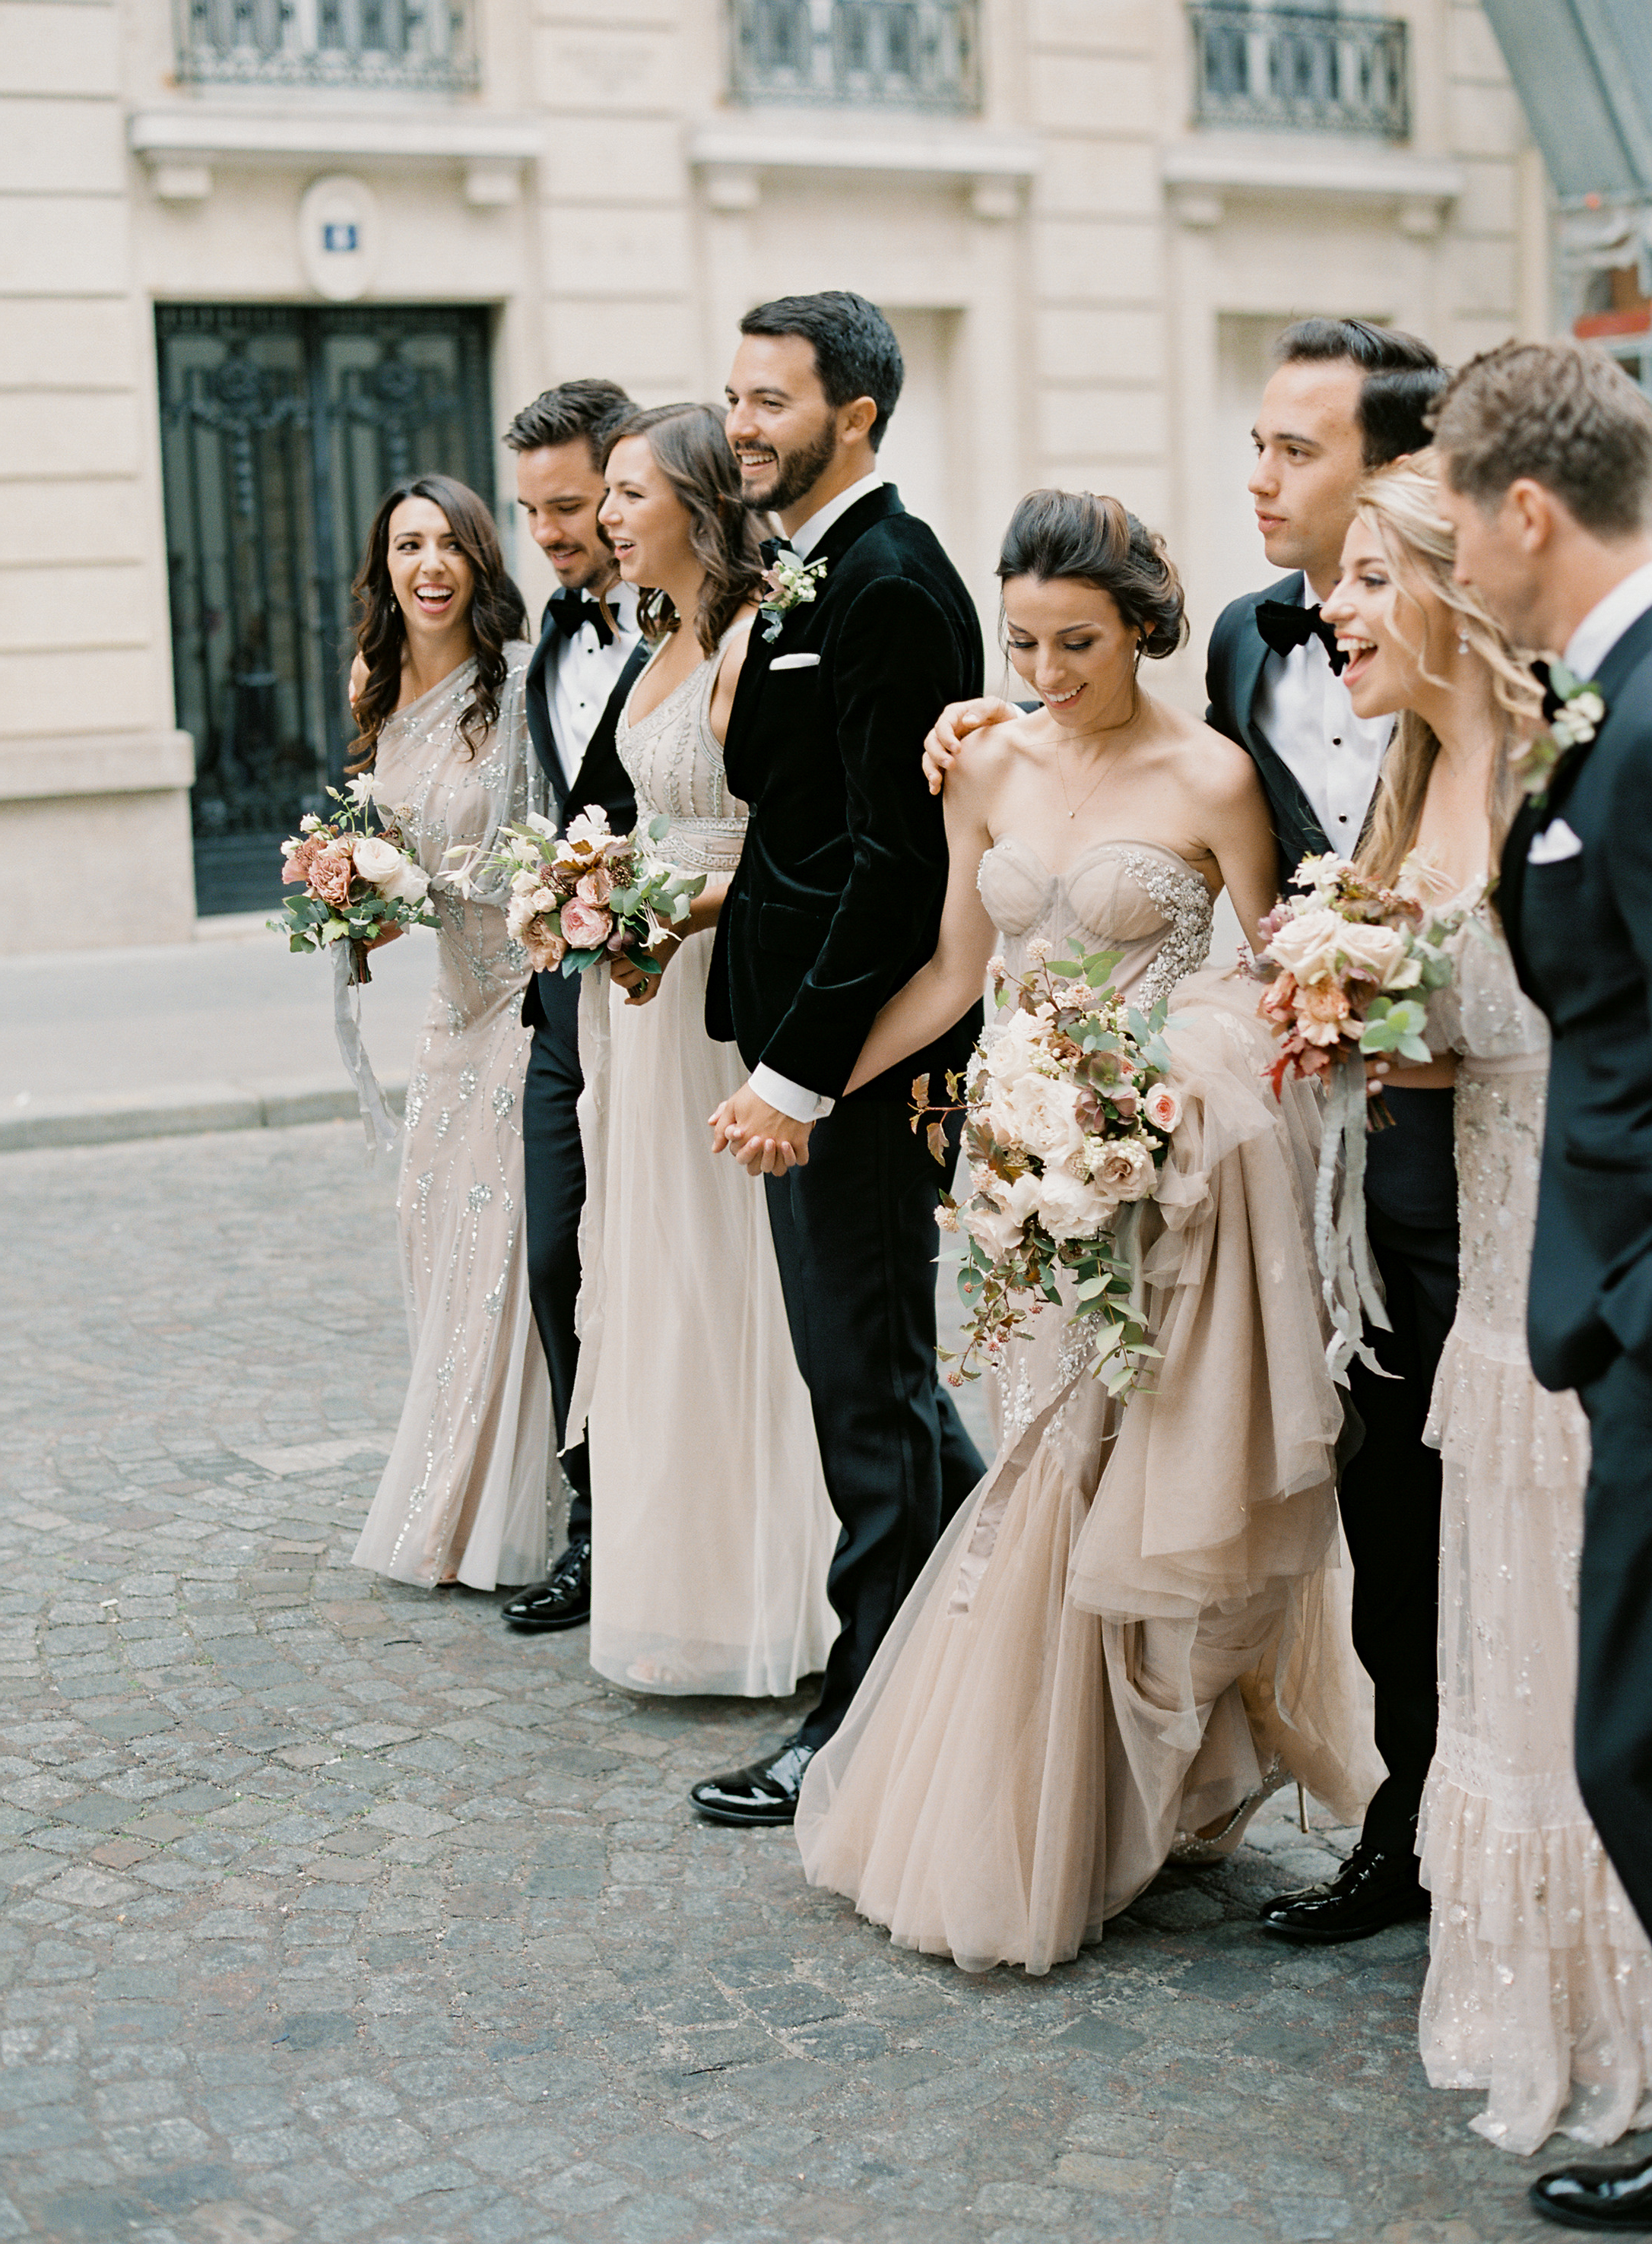 Paris-France-Film-Wedding-Carrie King Photographer-119.jpg